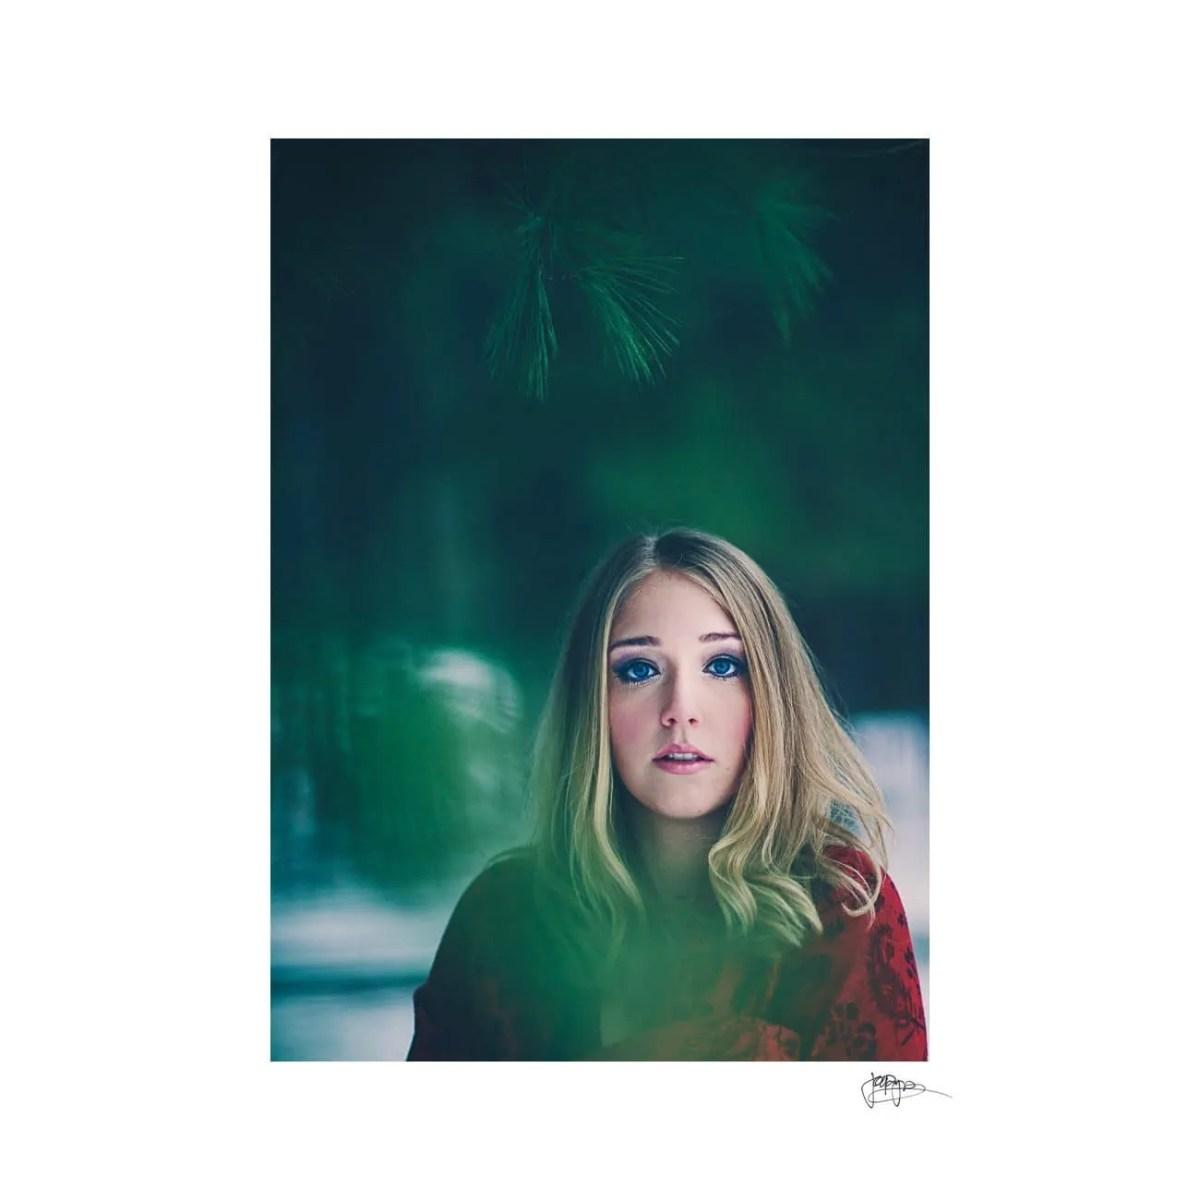 raleigh portrait photographer shot through pines